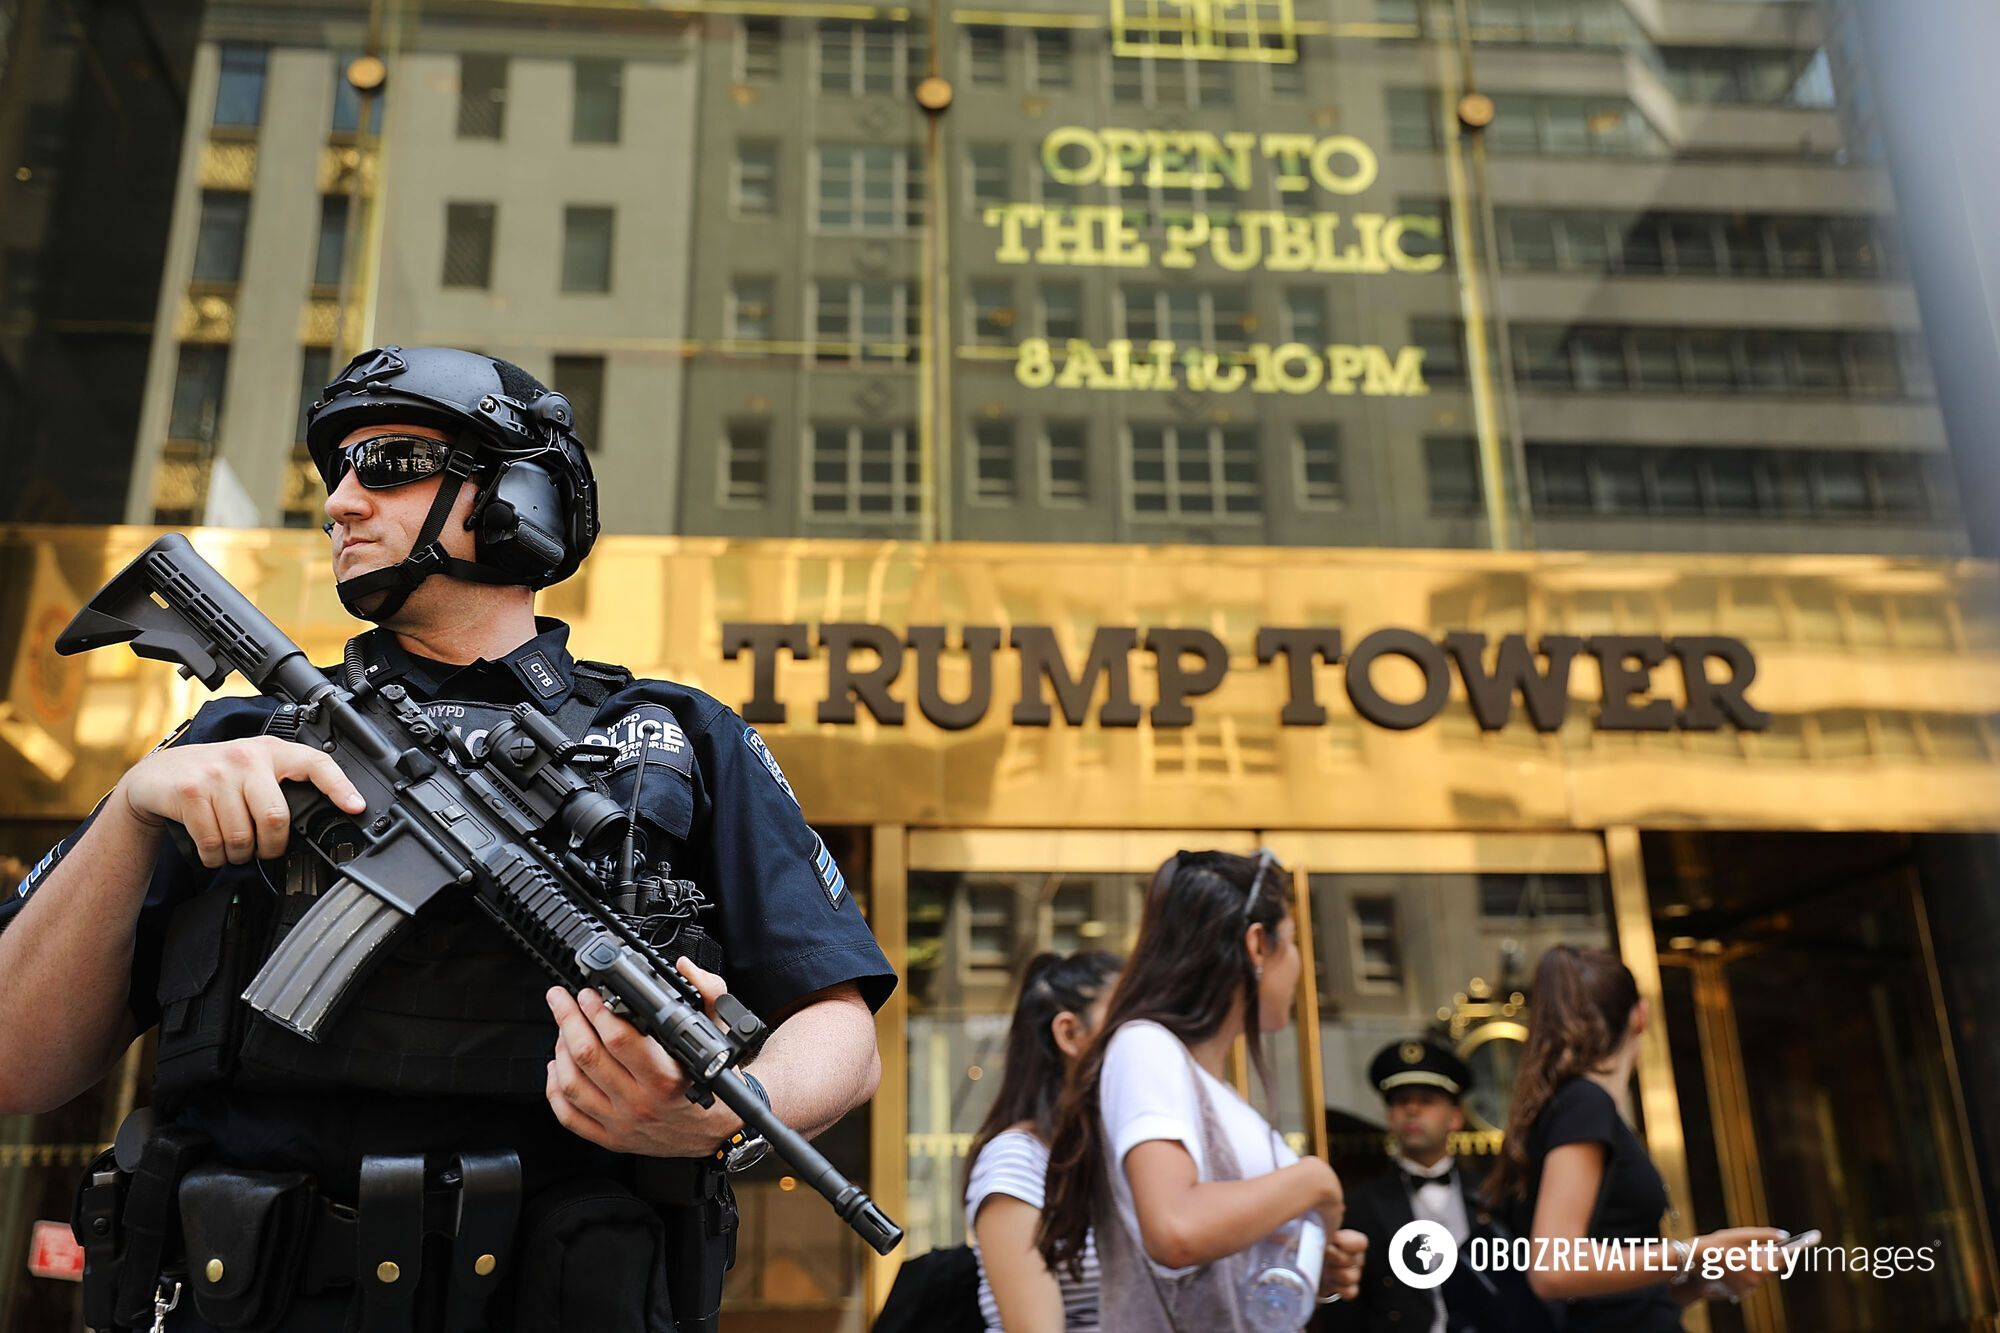 Trump Tower у Нью-Йорку